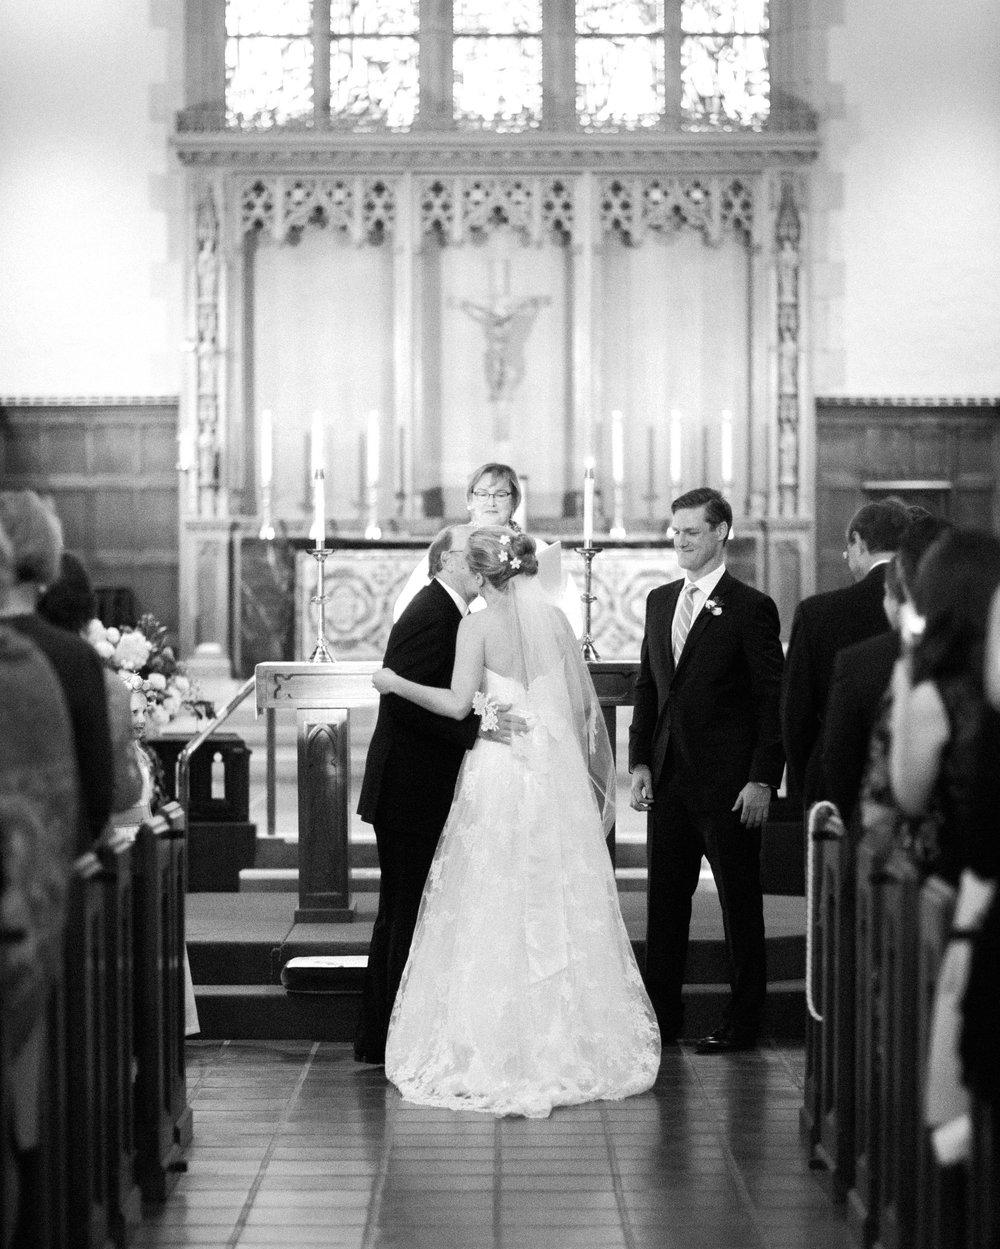 biltmore_santa_barbara_wedding_photos_coral_casino_021.jpg